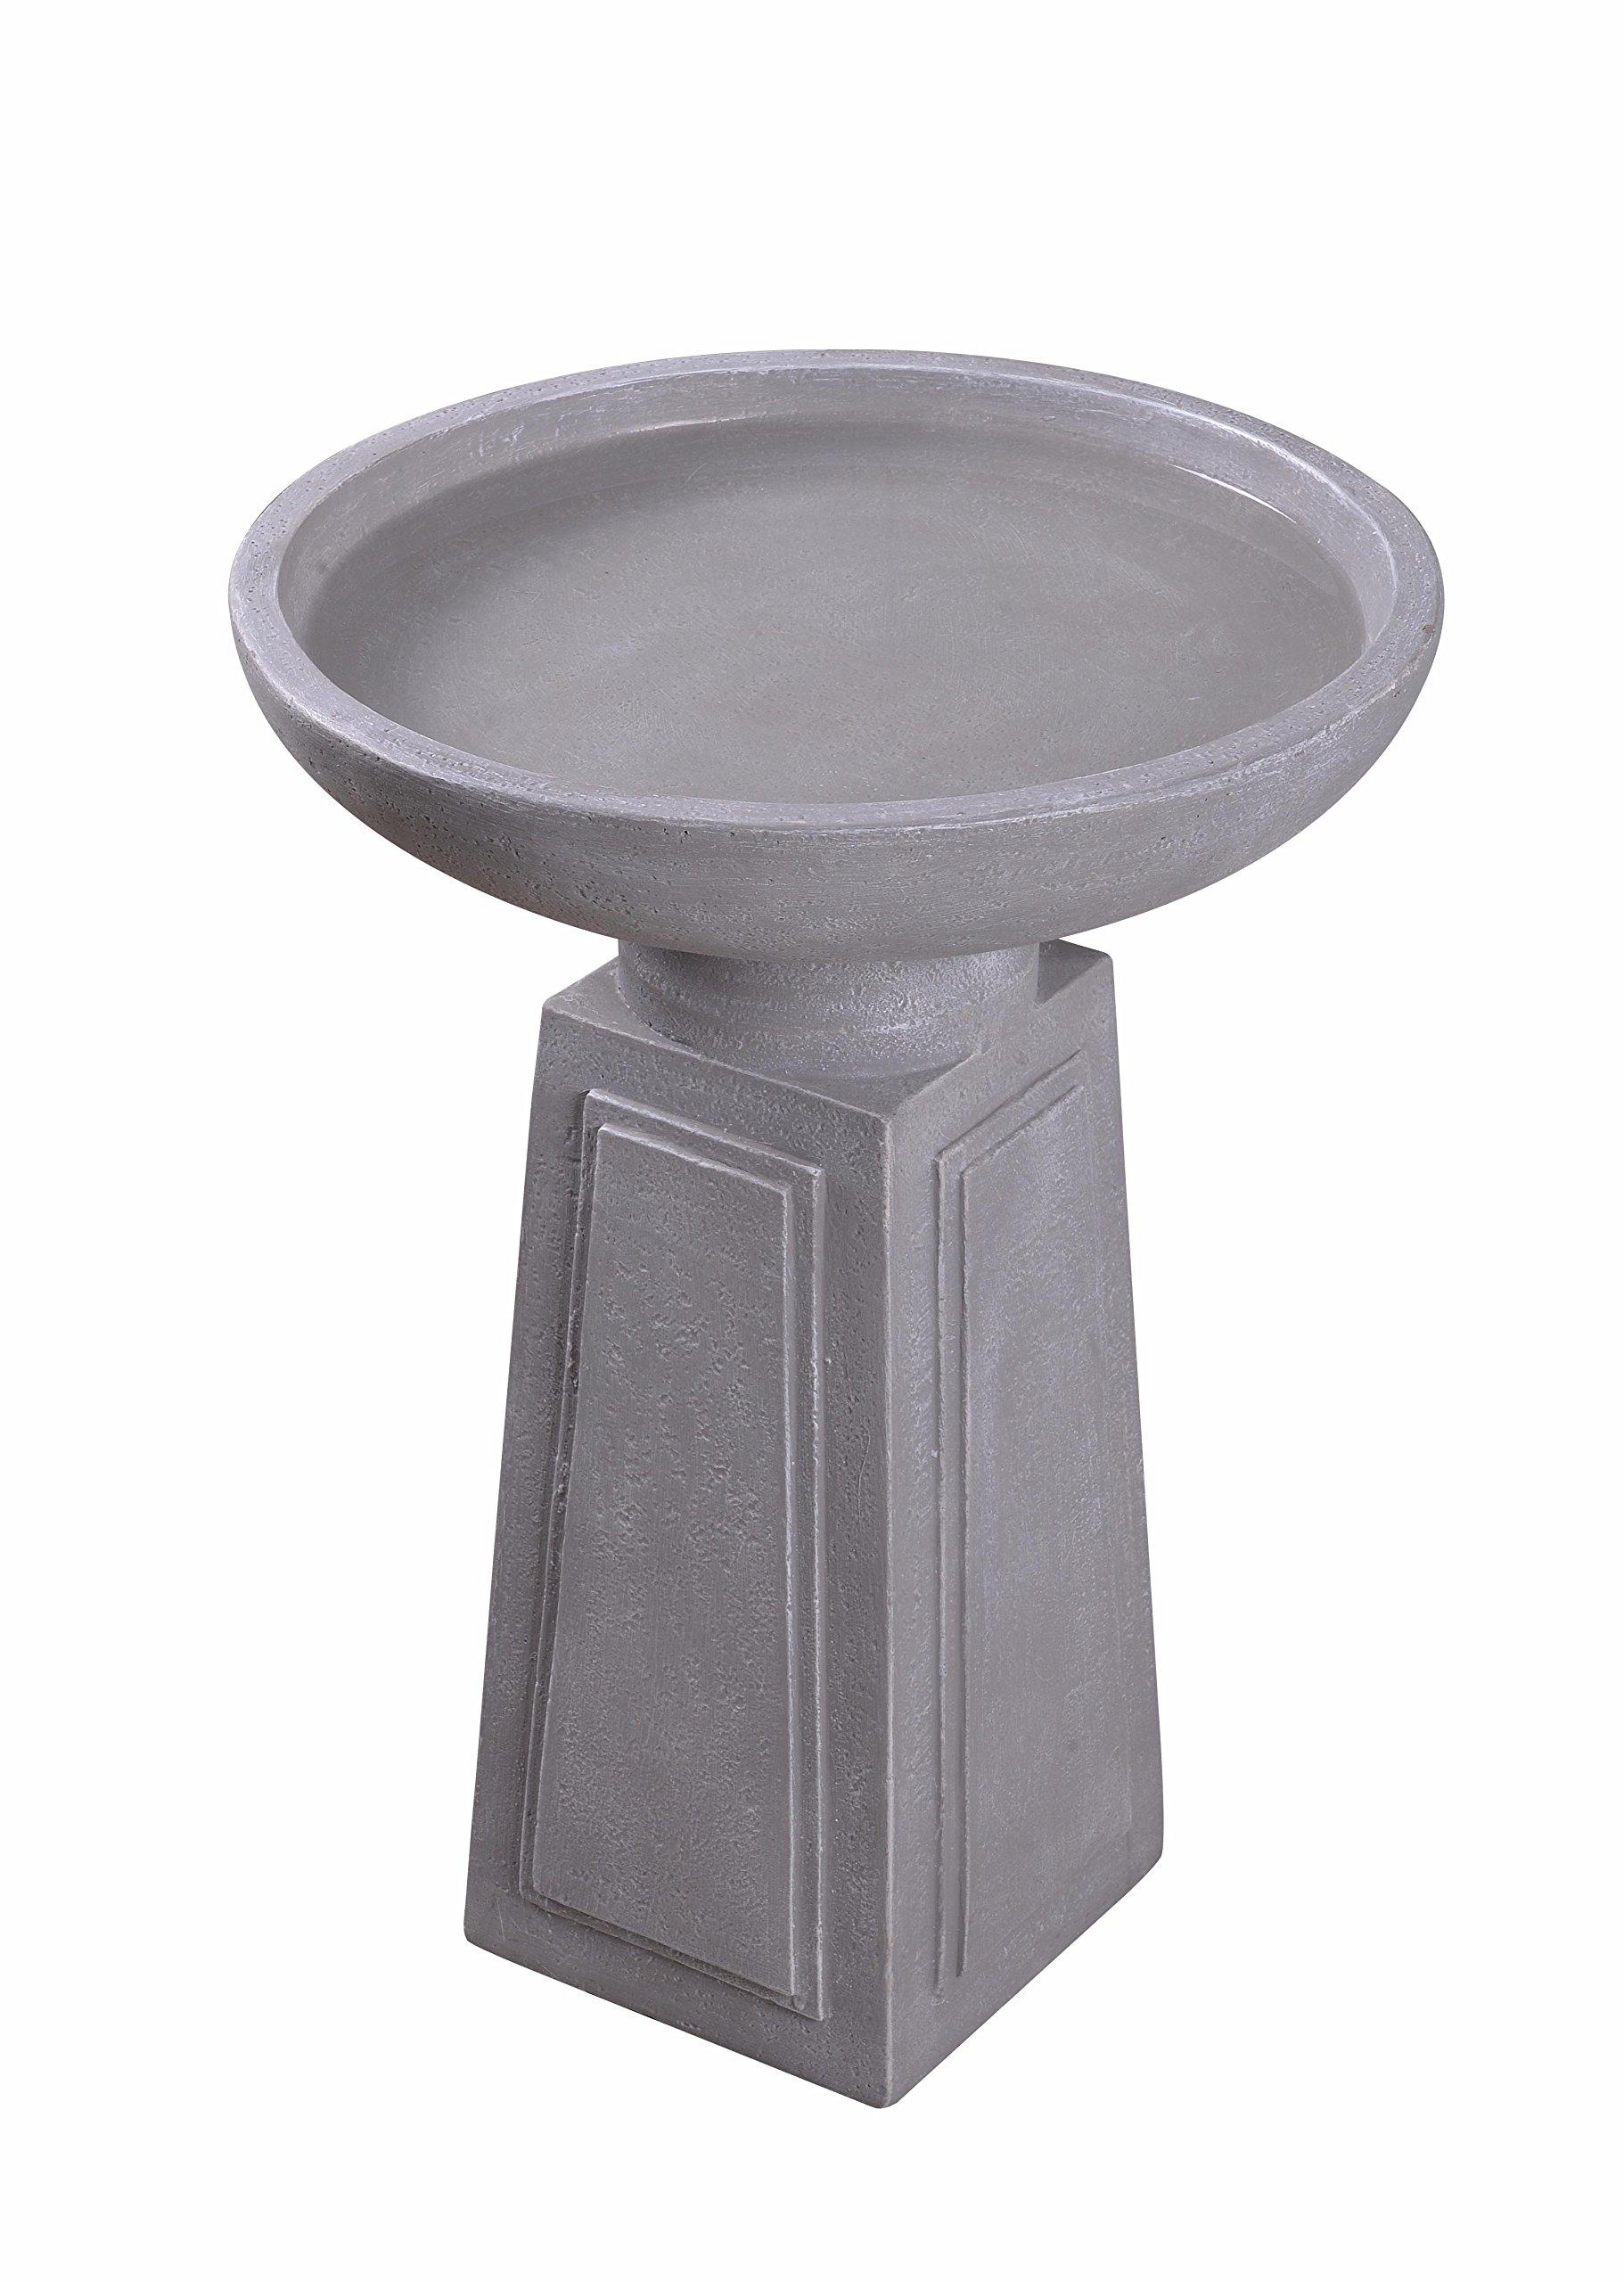 Kenroy Home 51050CON Pedestal Birdbath 21.5 Inch Height Concrete Finish